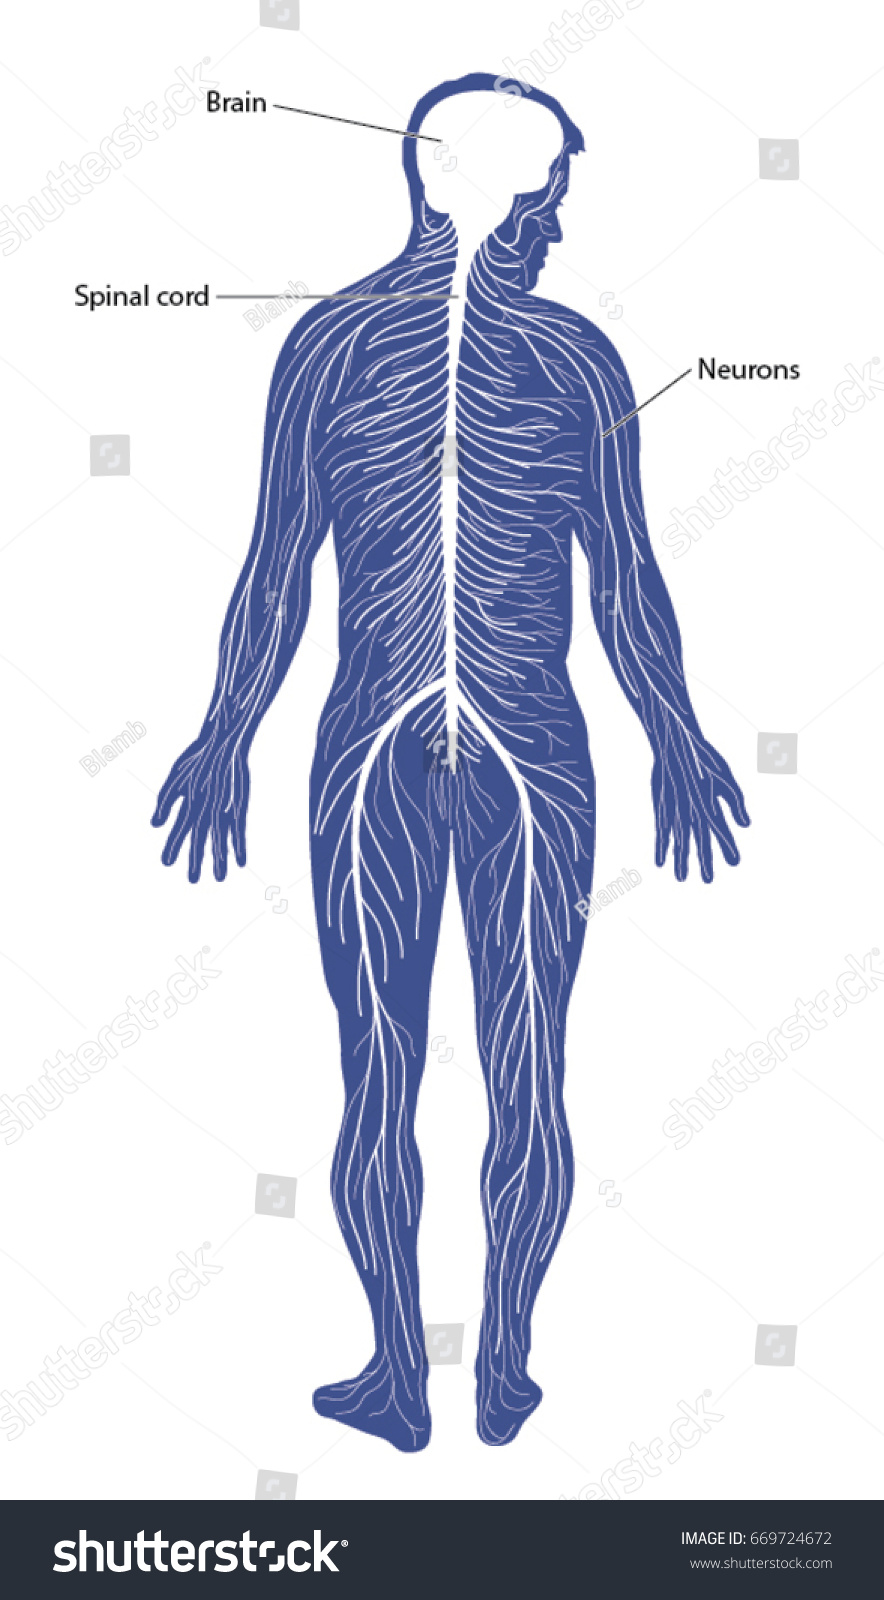 Schematic diagram nervous system comprising brain stock vector schematic diagram of the nervous system comprising of the brain spinal cord and peripheral ccuart Gallery